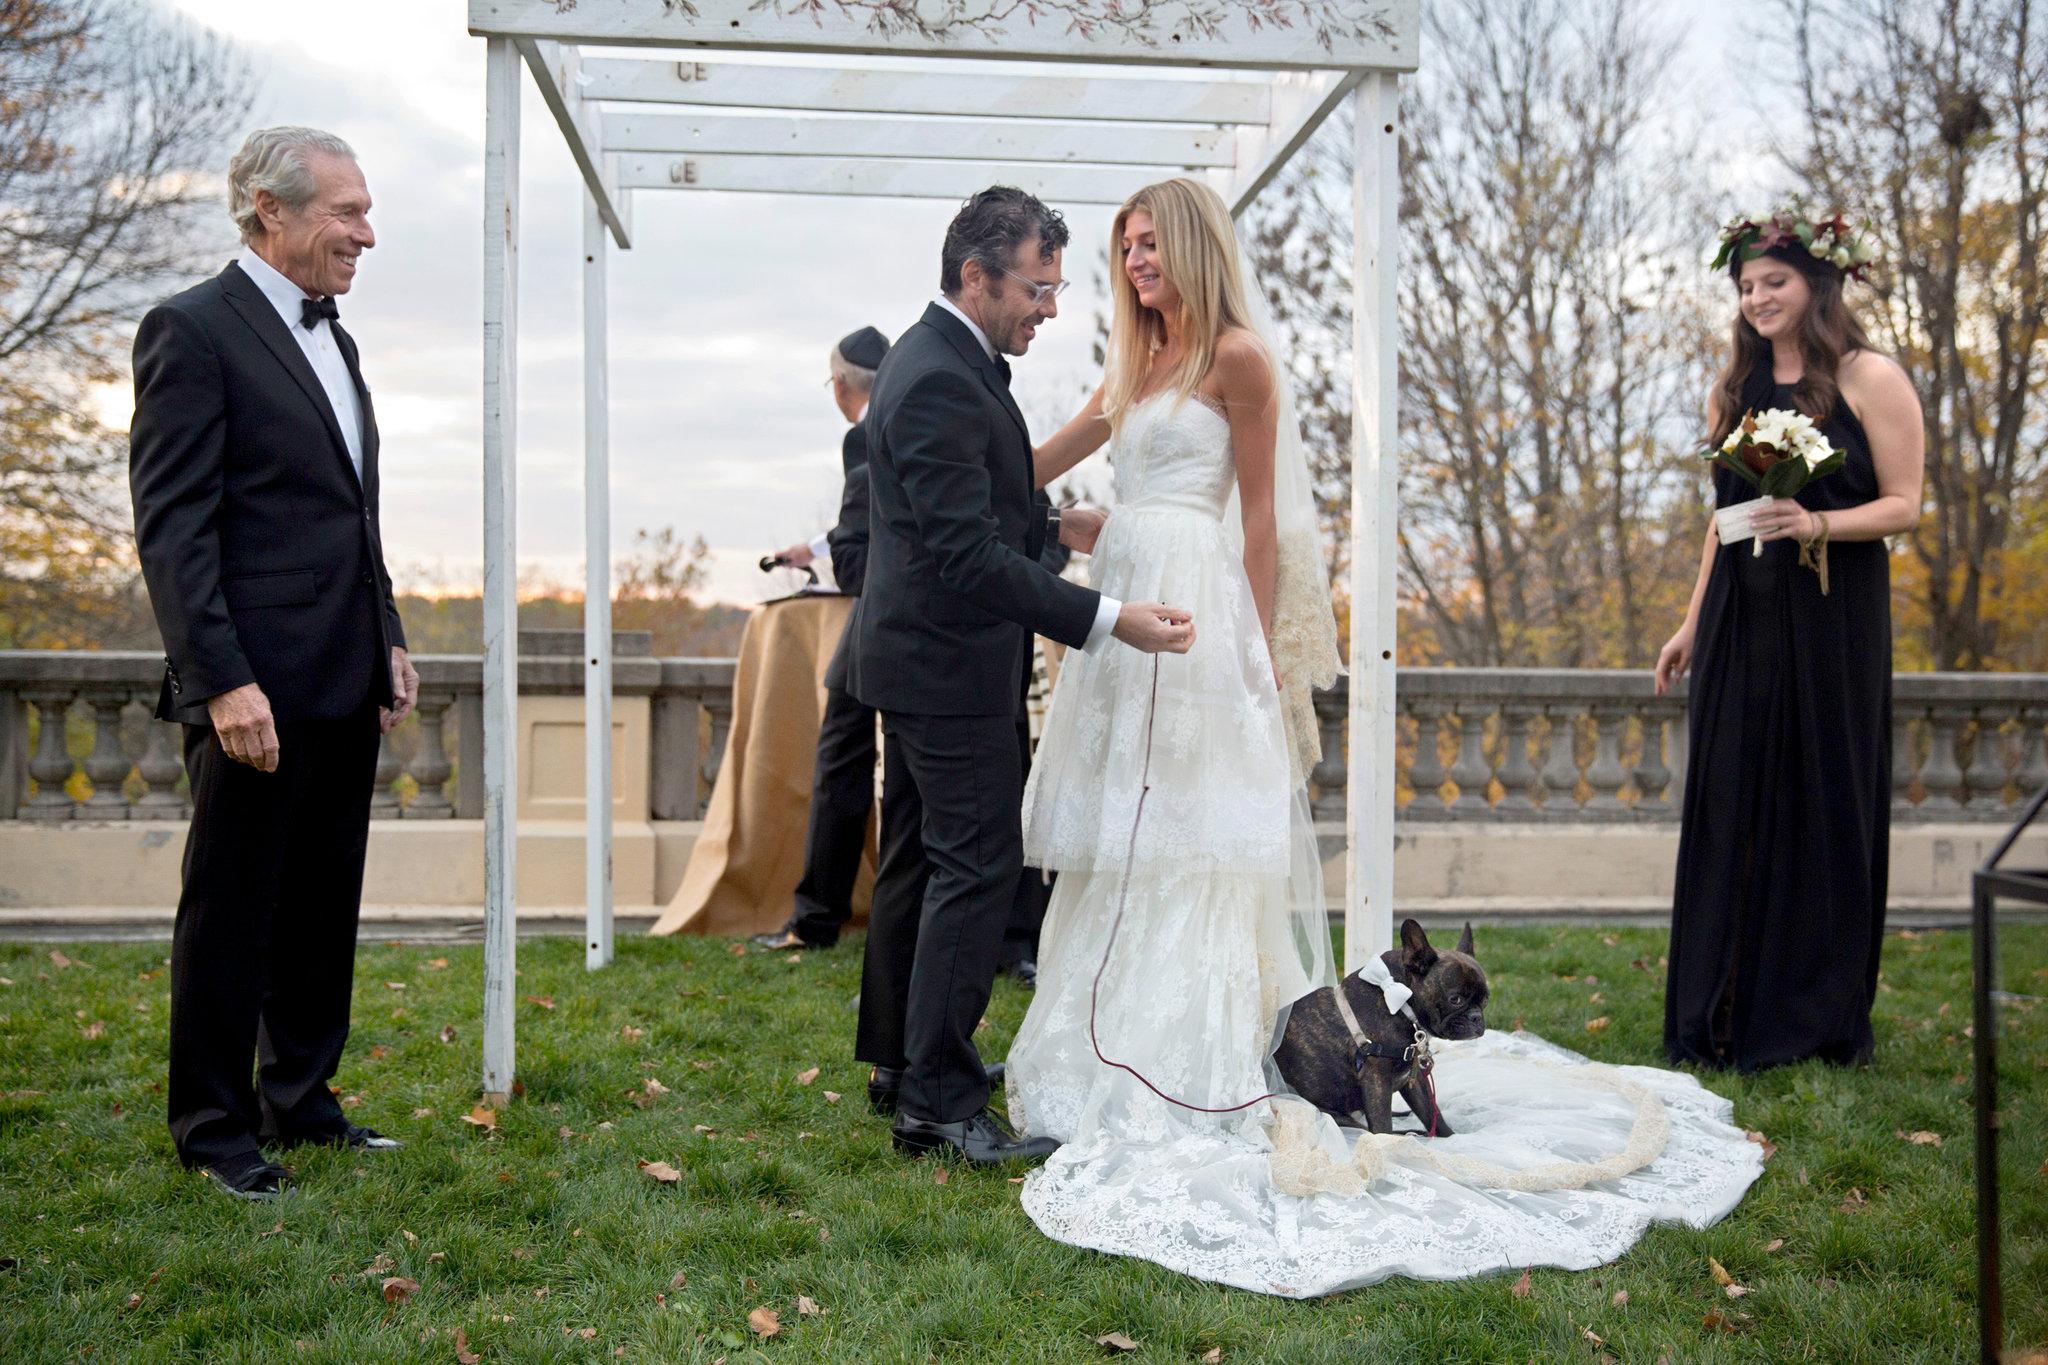 Sanders Bryan Sarah Huckabee And Wedding